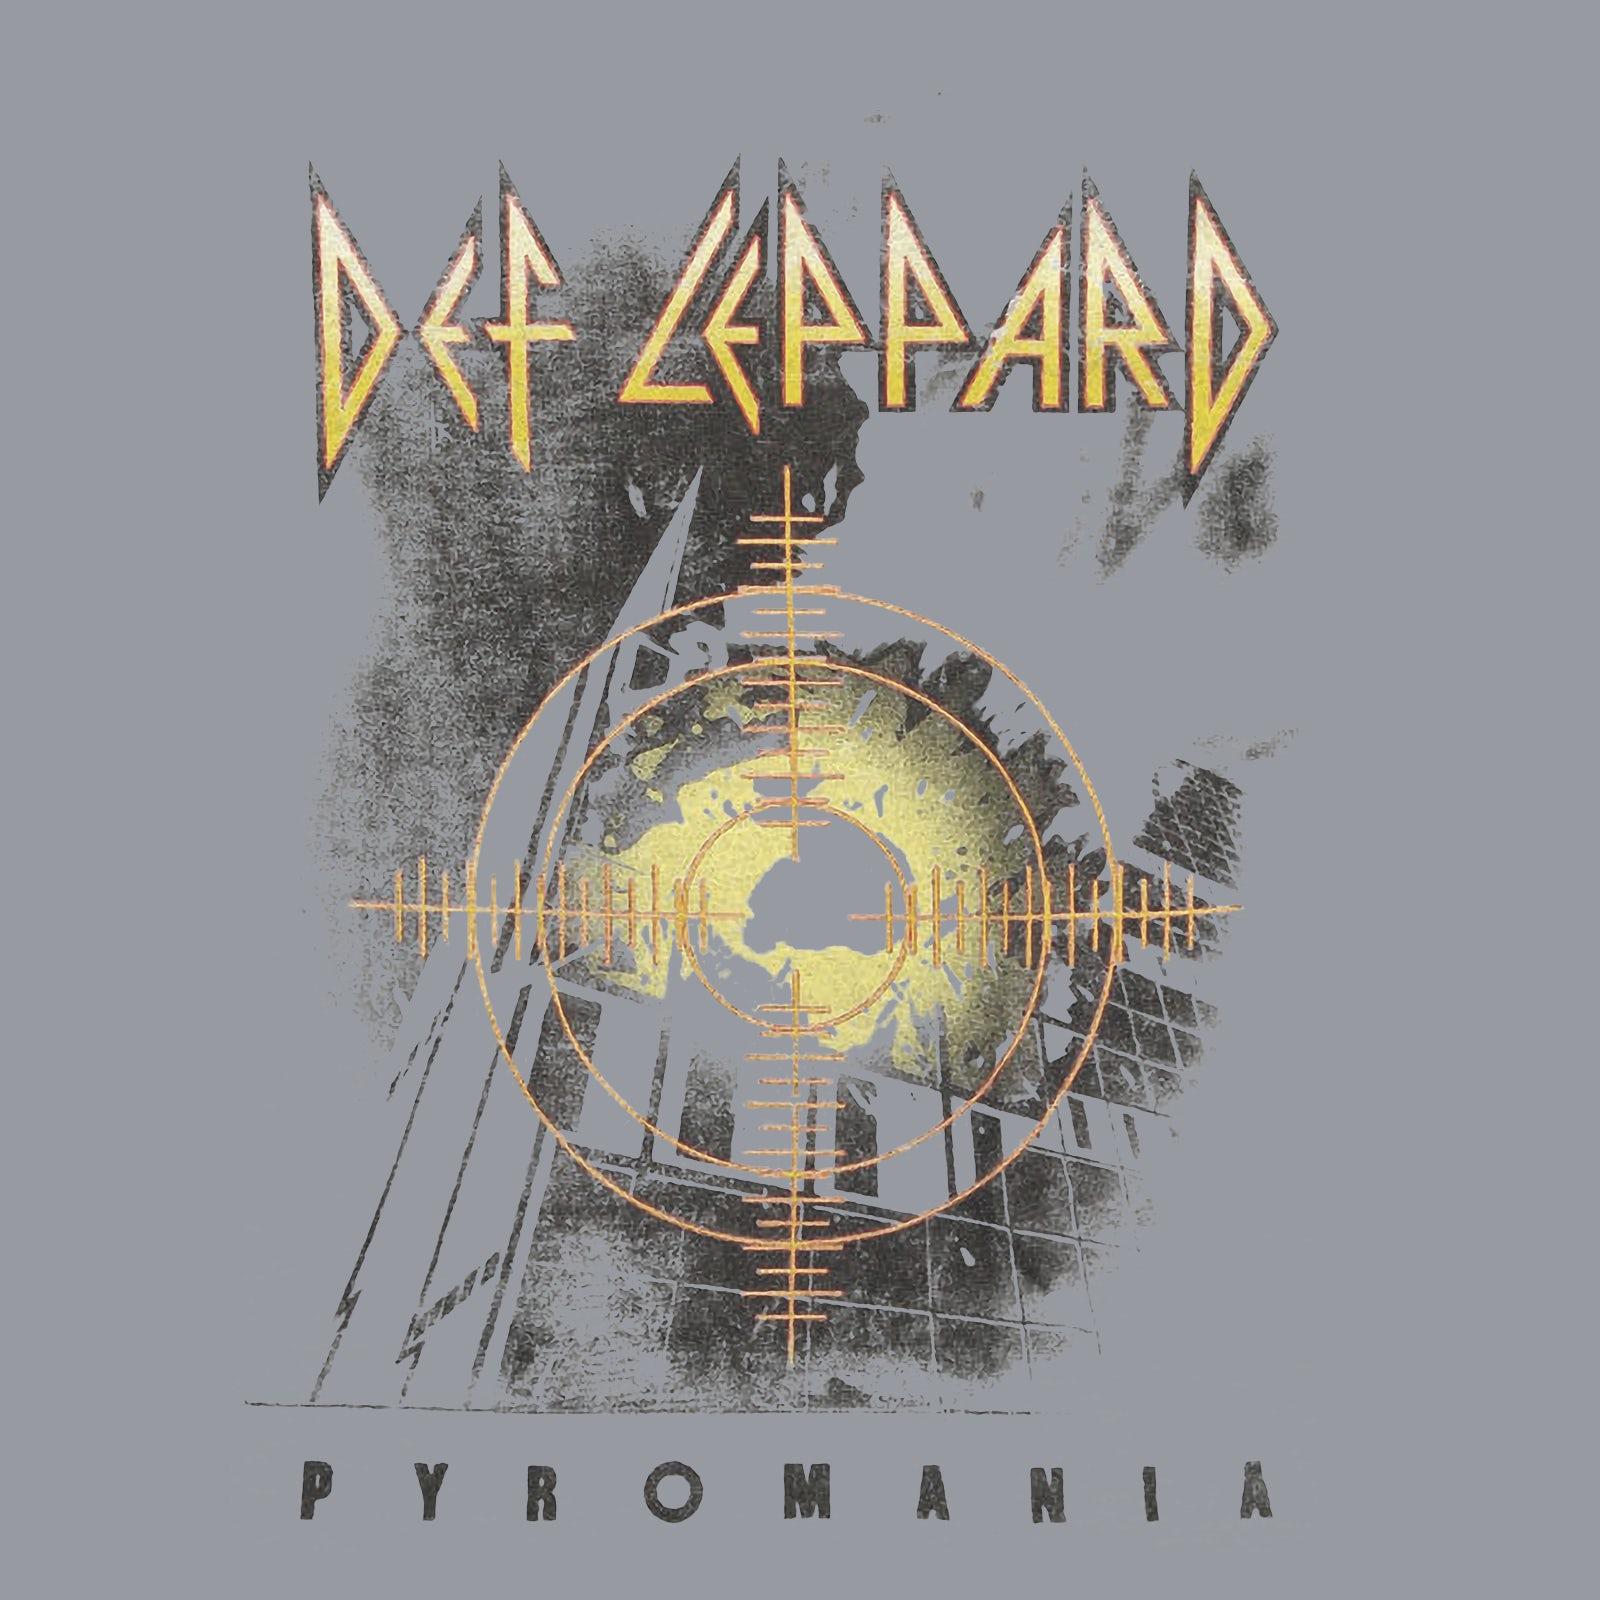 DEF LEPPARD pyromanie Noir T Shirt New Official Band Merch Album Artwork Soft